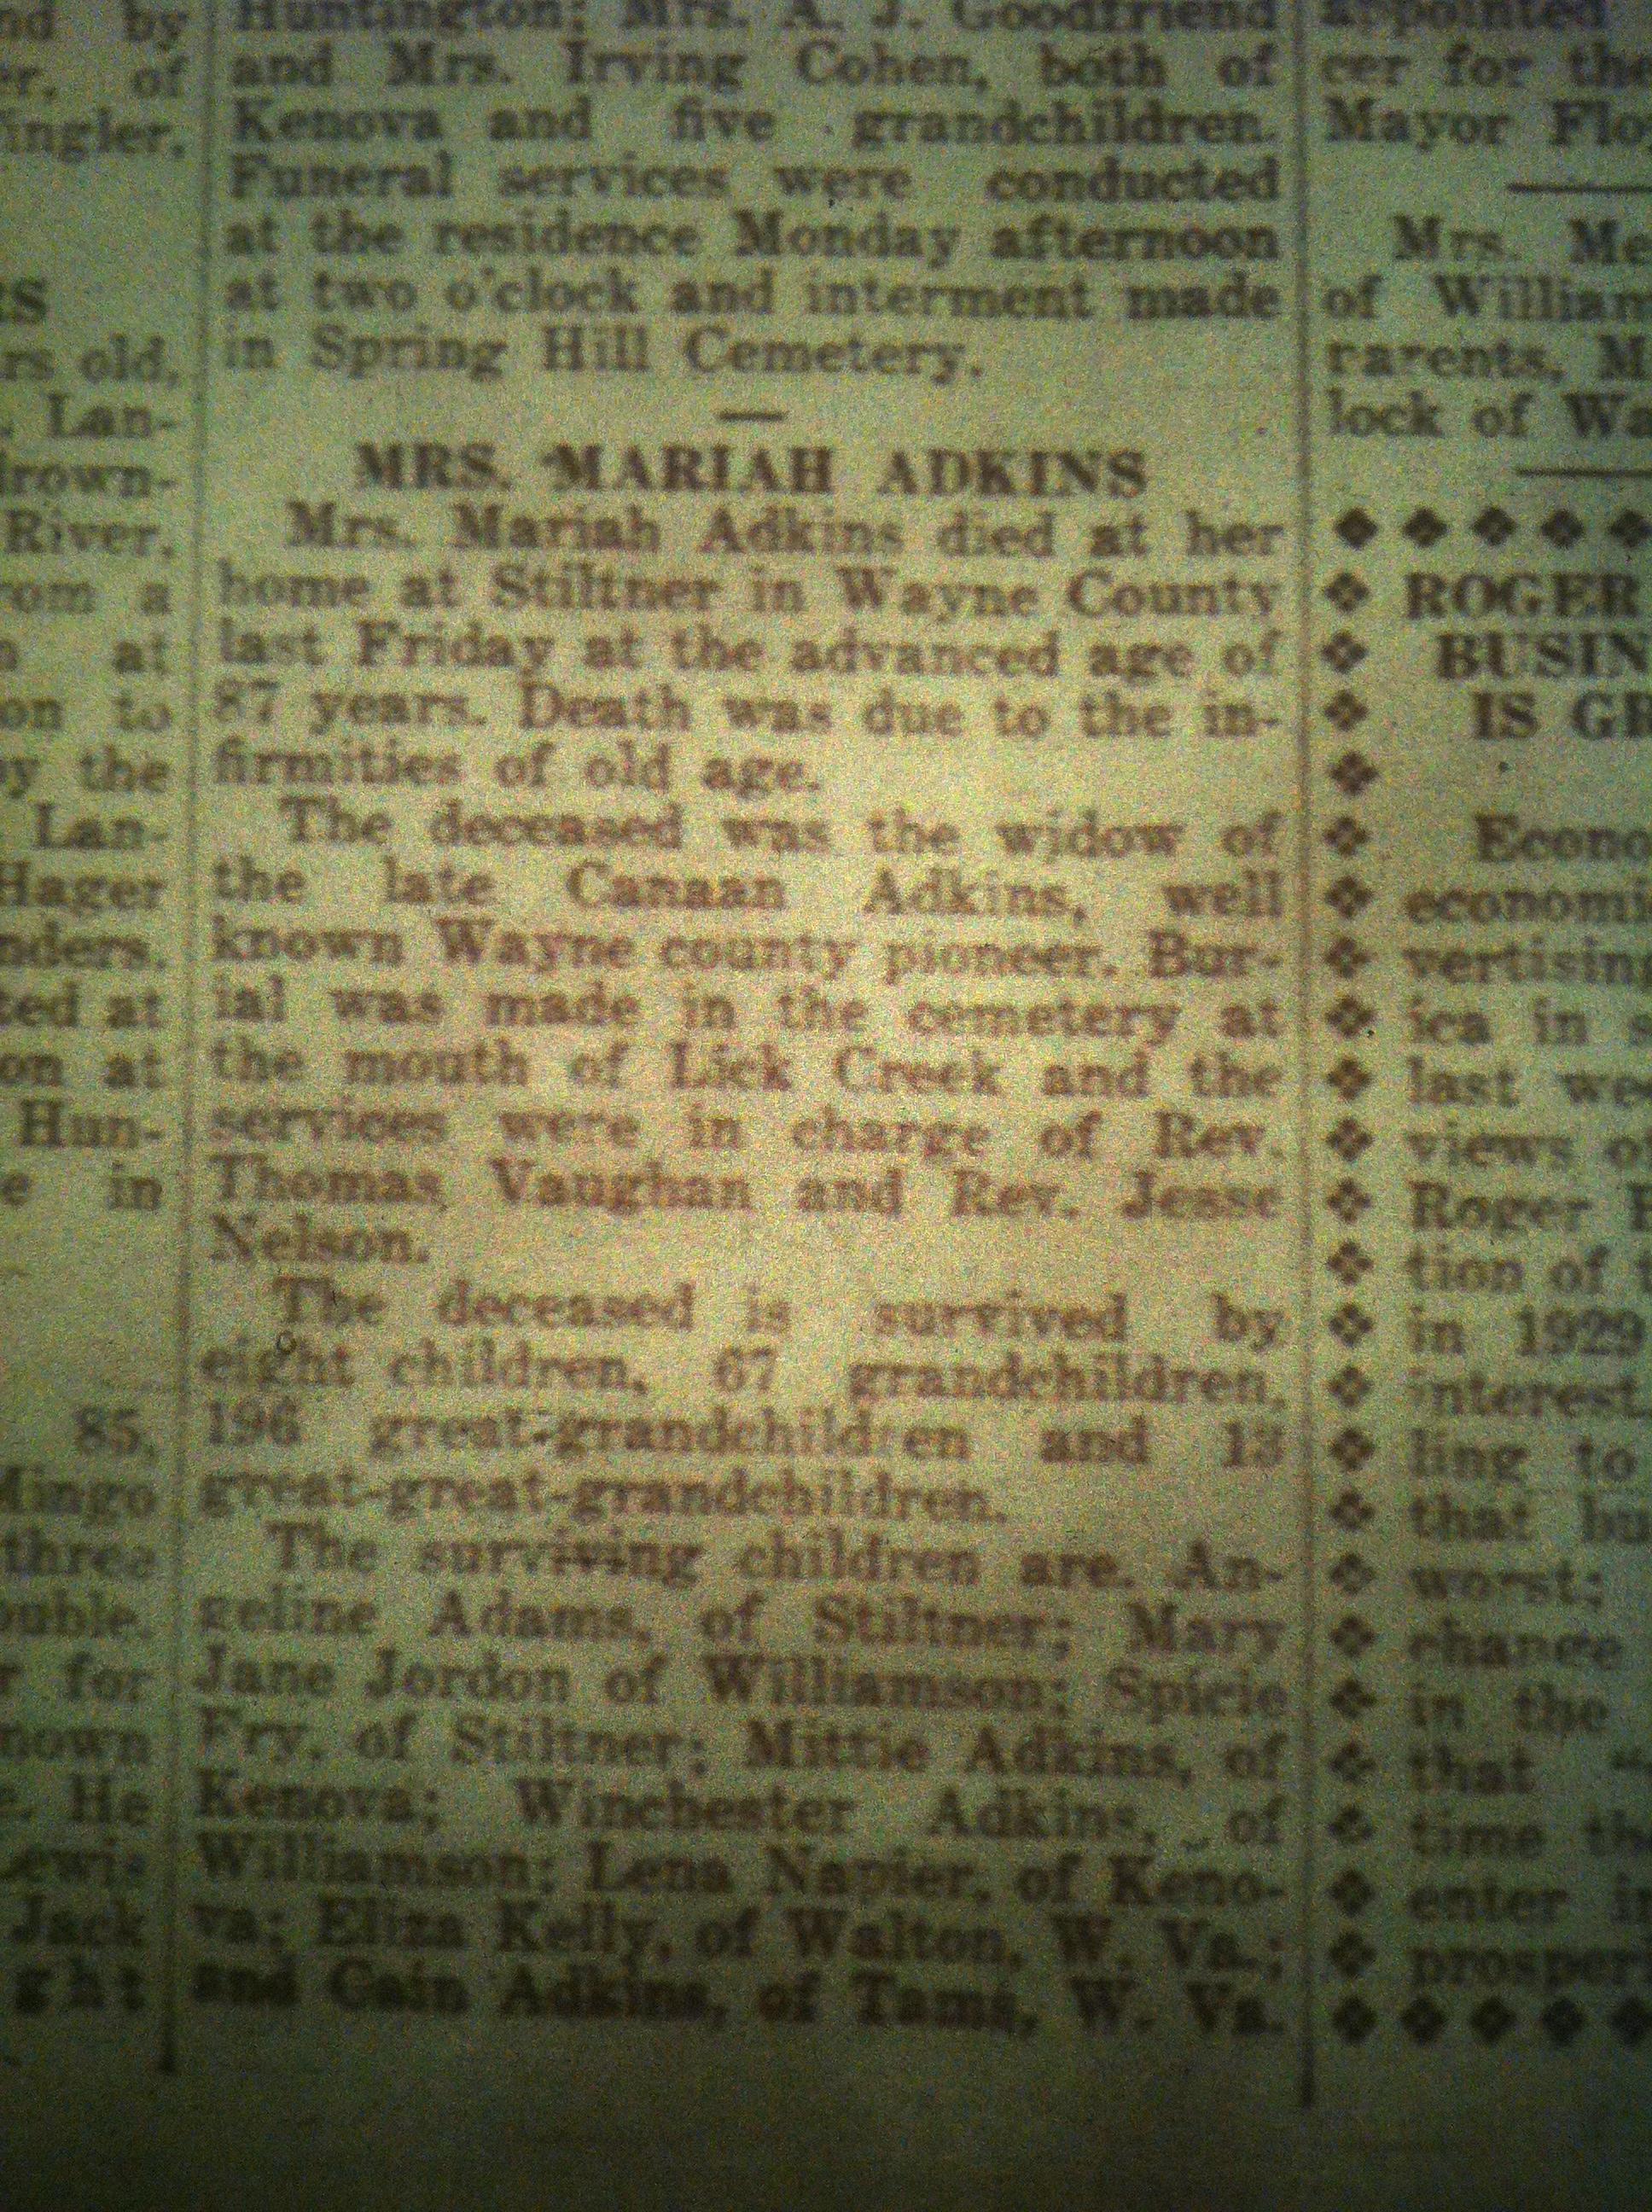 Mariah Adkins Obituary WCN 07.02.1931 1.JPG